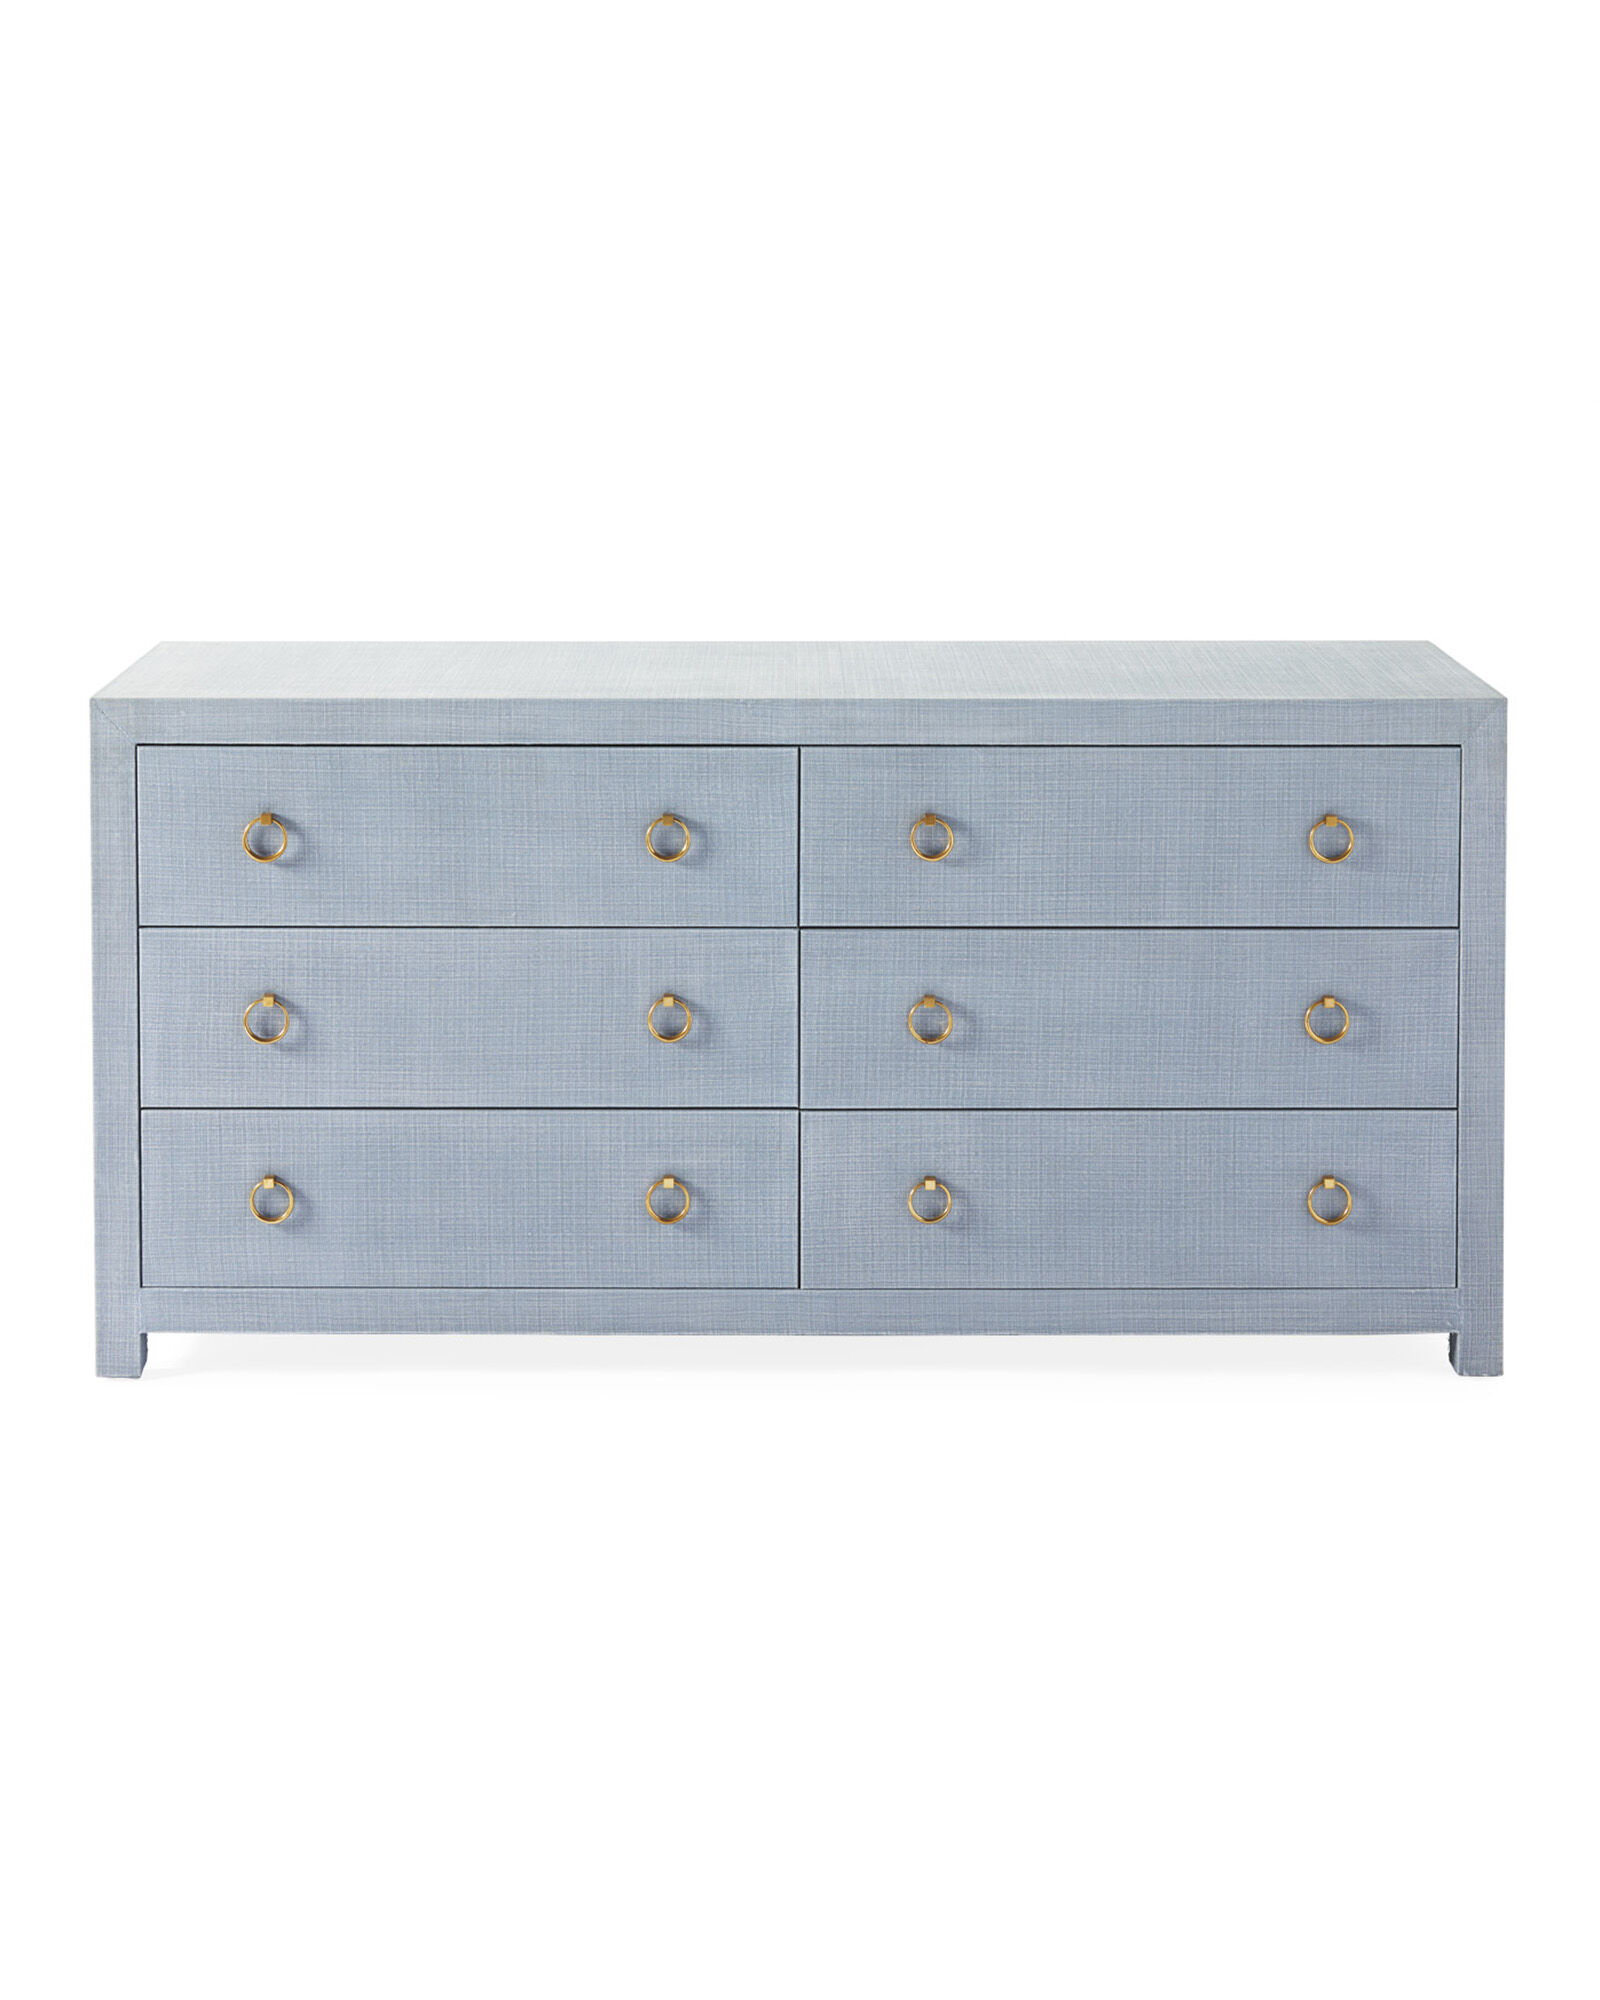 Driftway Dresser in Coastal Blue